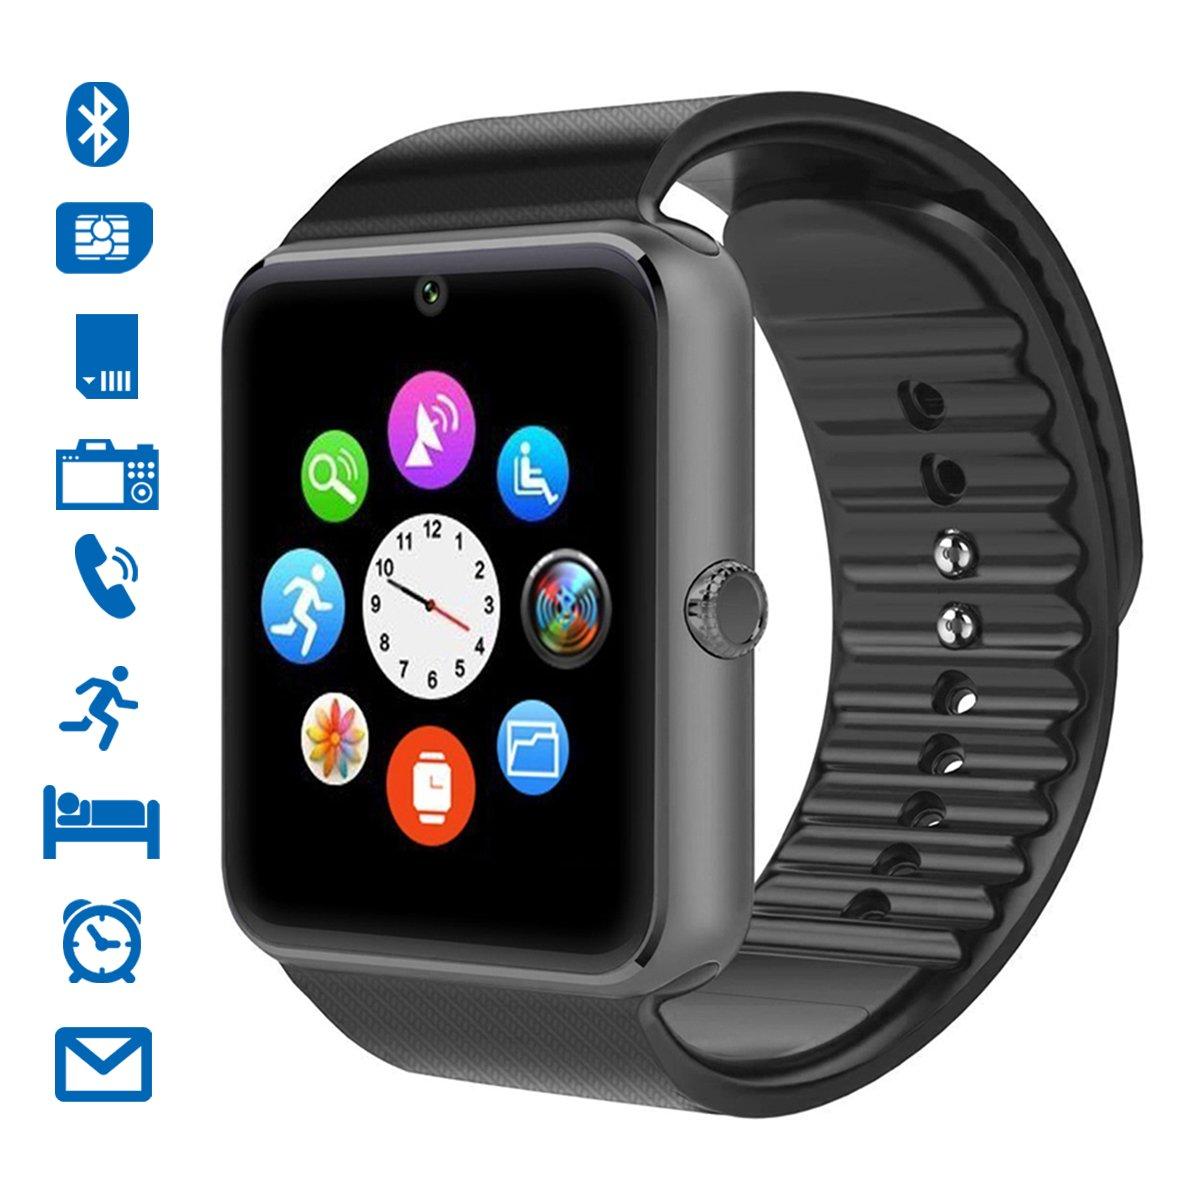 Smartwatch, CHEREEKI Bluetooth Smart Watch con Camera Orologio Intelligente con Macchina Fotografica SIM / TF Card Slot Schermo Touch Contapassi per Smartphone Android Samsung Huawei Honor HTC LG Sony (Nero-A) product image